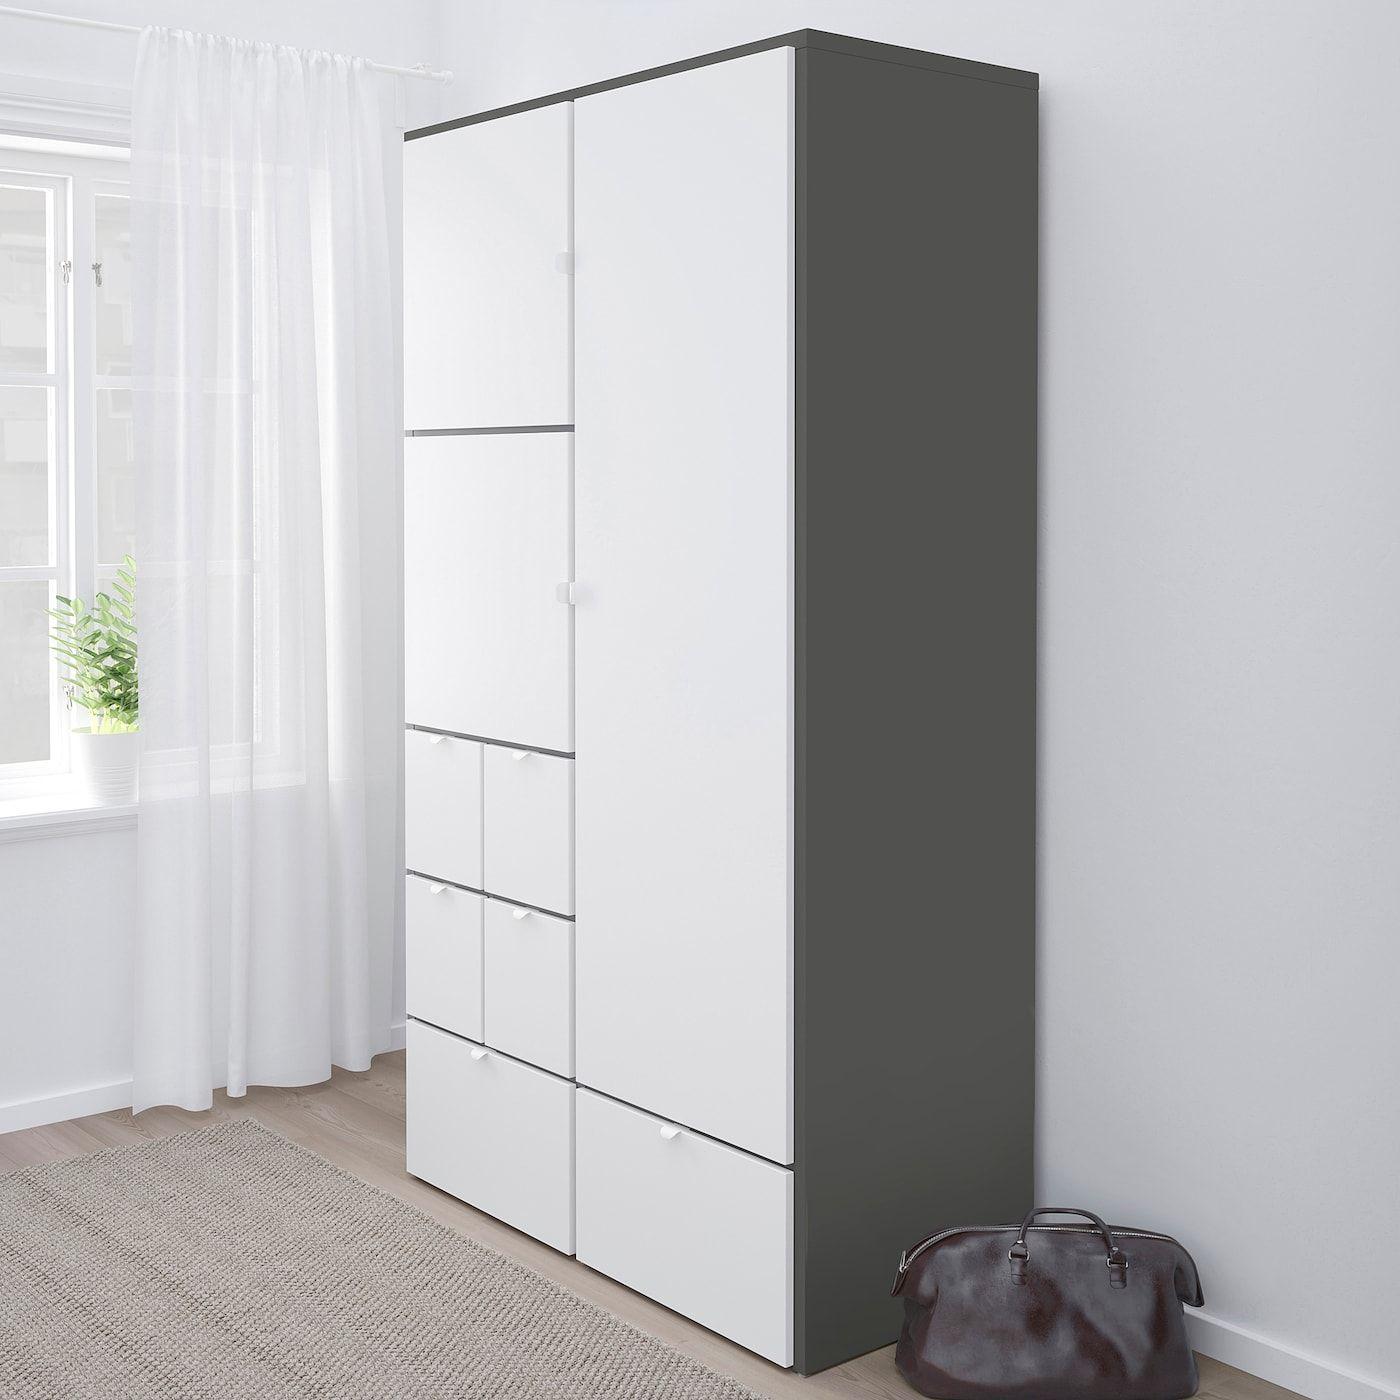 Ikea Visthus Kleiderschrank Kasten Grau Weiss In 2020 Kleiderschrank Grau Kleiderschrank Kinderzimmer Ikea Kinderzimmer Kleiderschrank